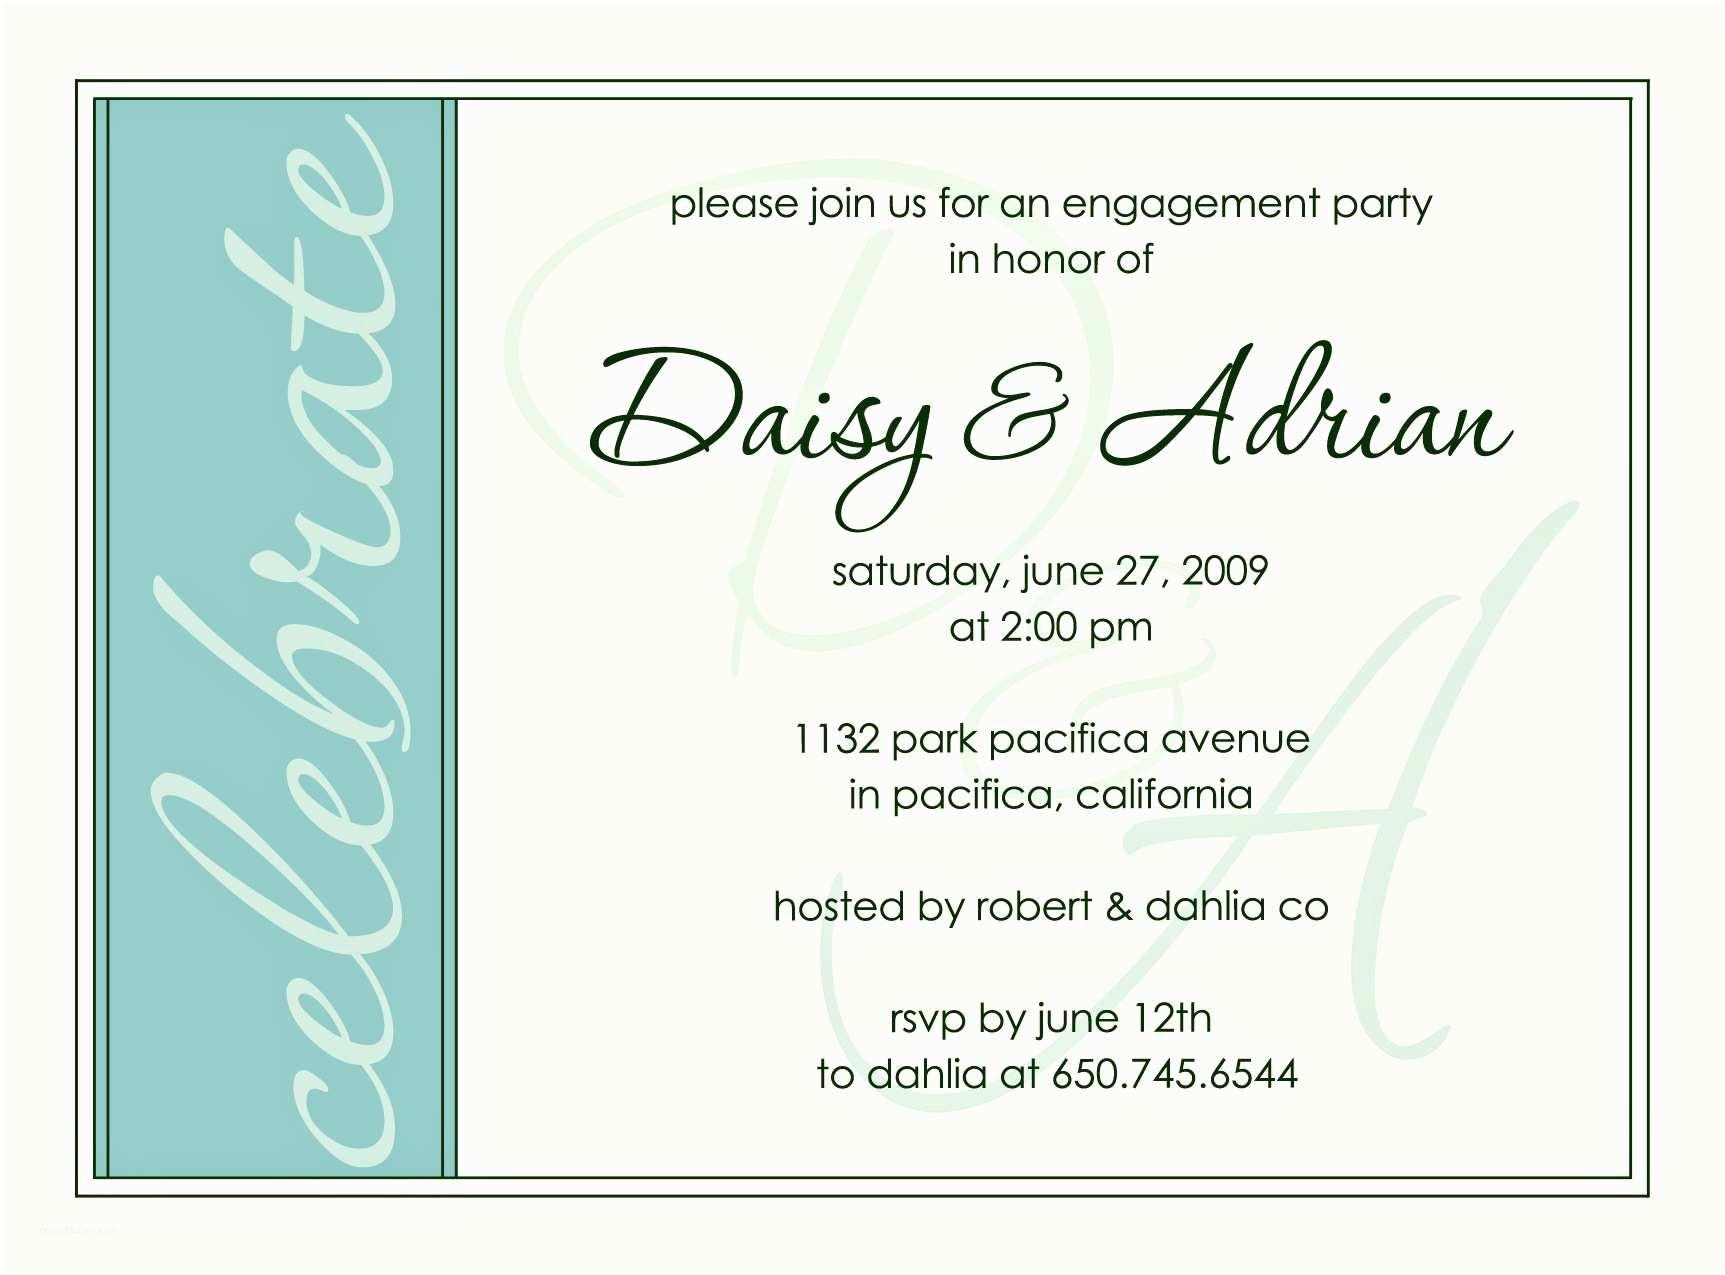 Birthday Invitations Wording Engagement Party Invite